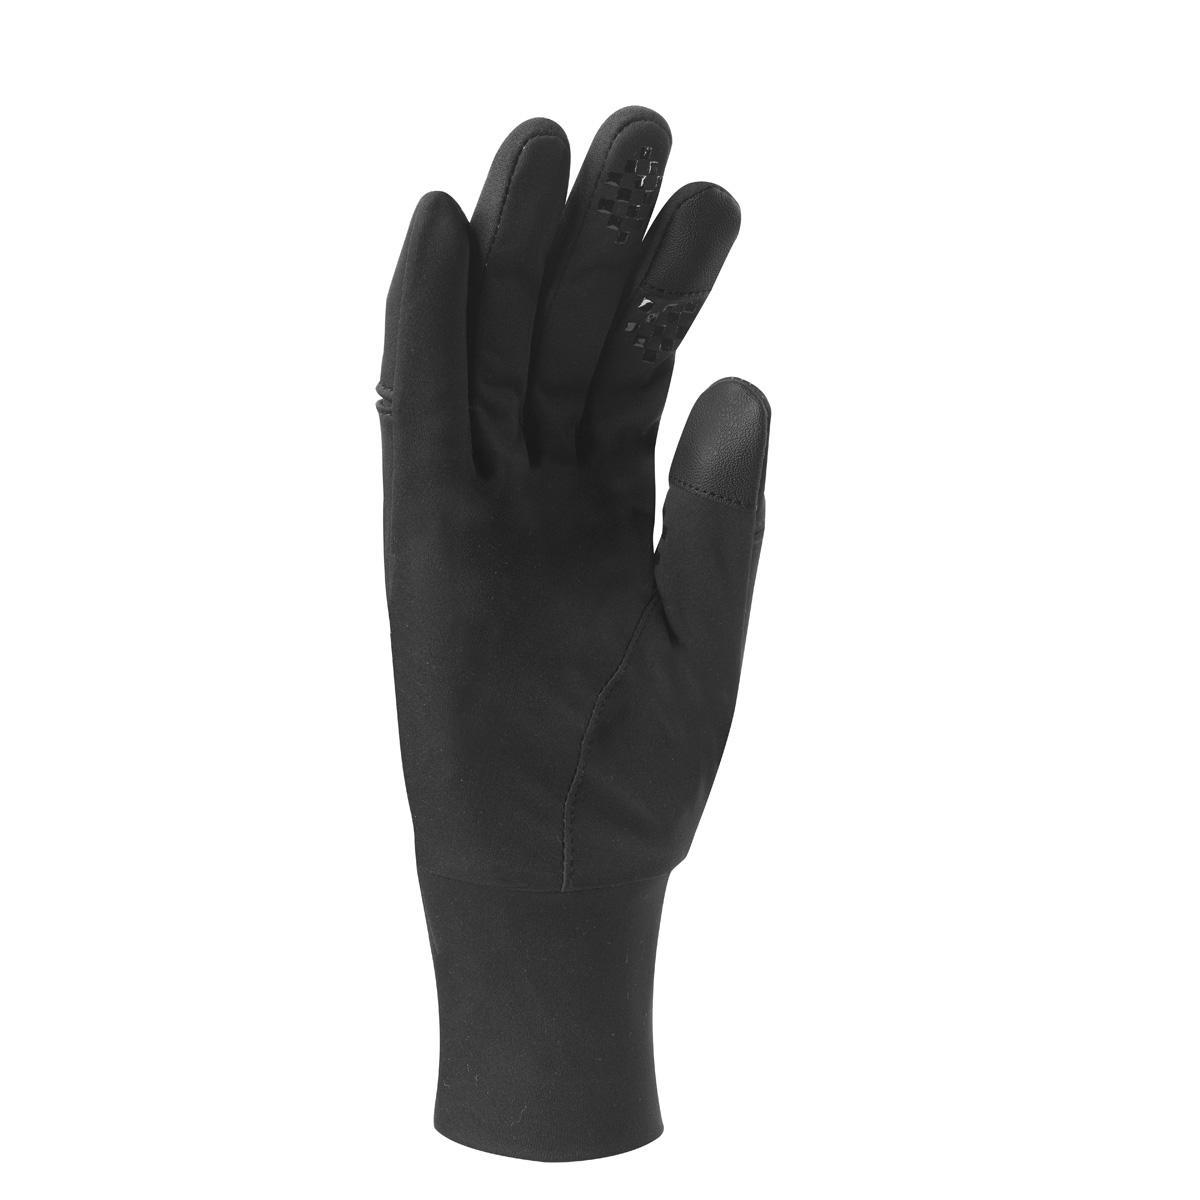 Nike Gloves Key Pocket: Nike Mens Shield Running Gloves